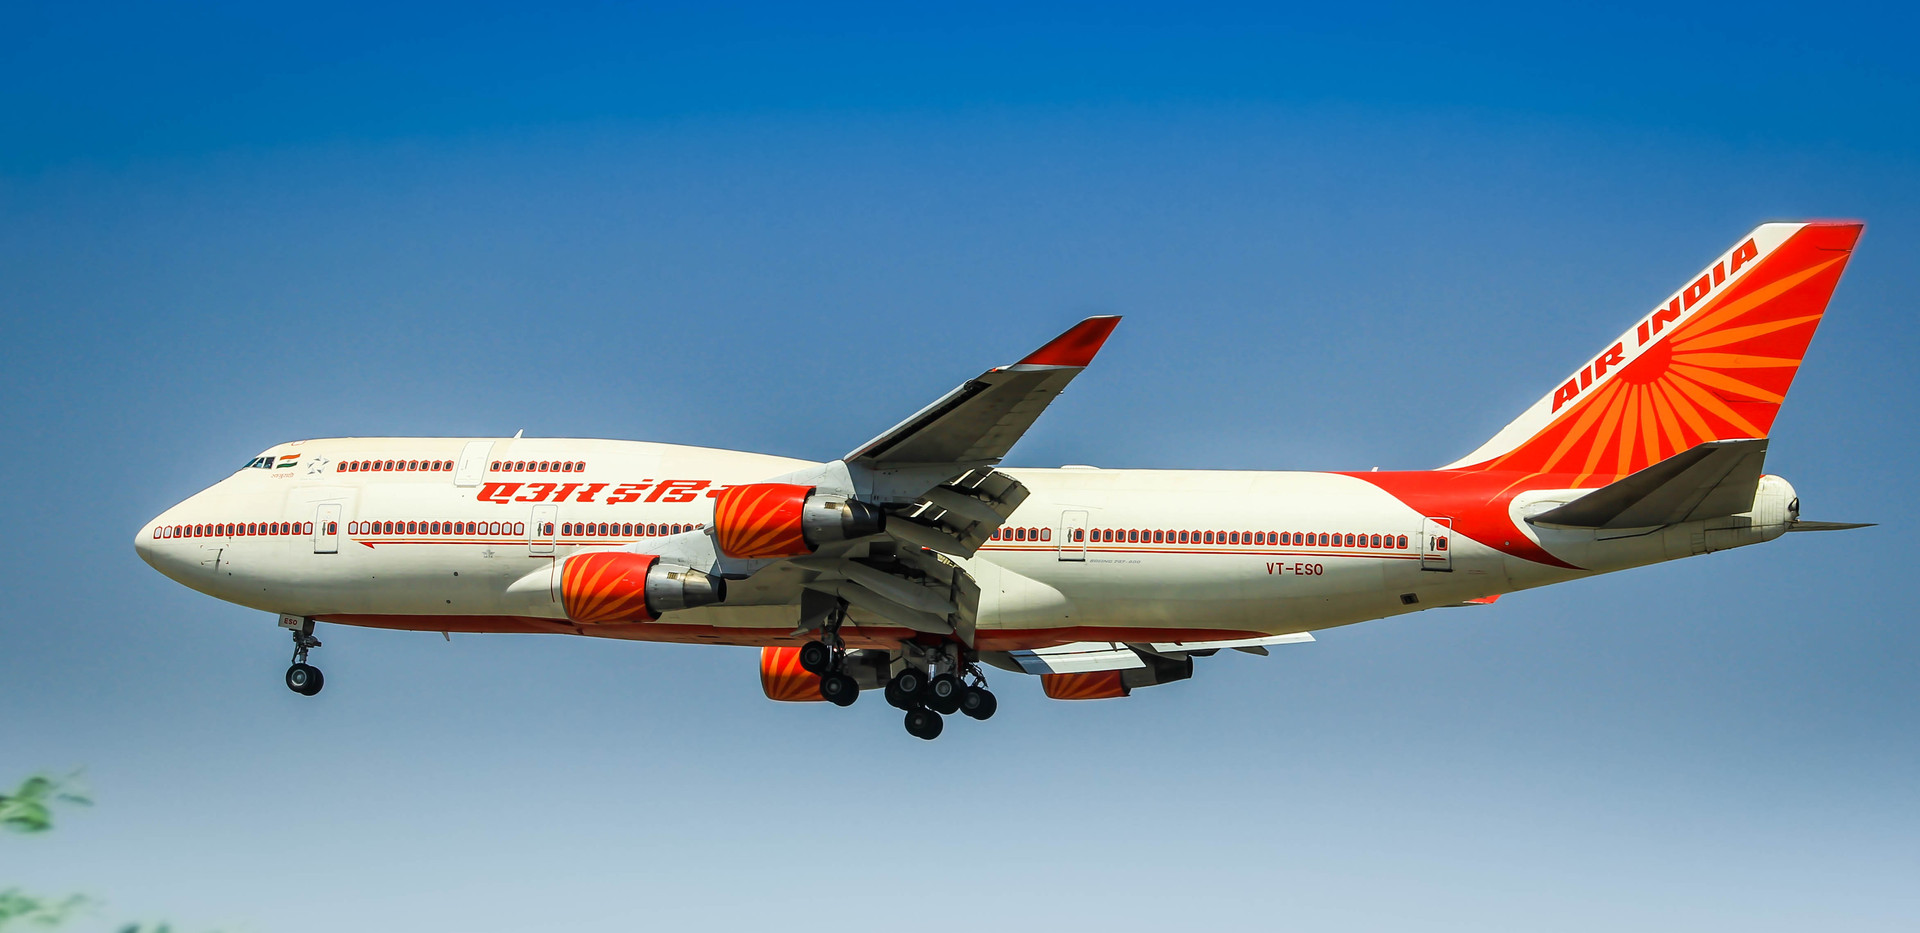 VT-ESO, Air India